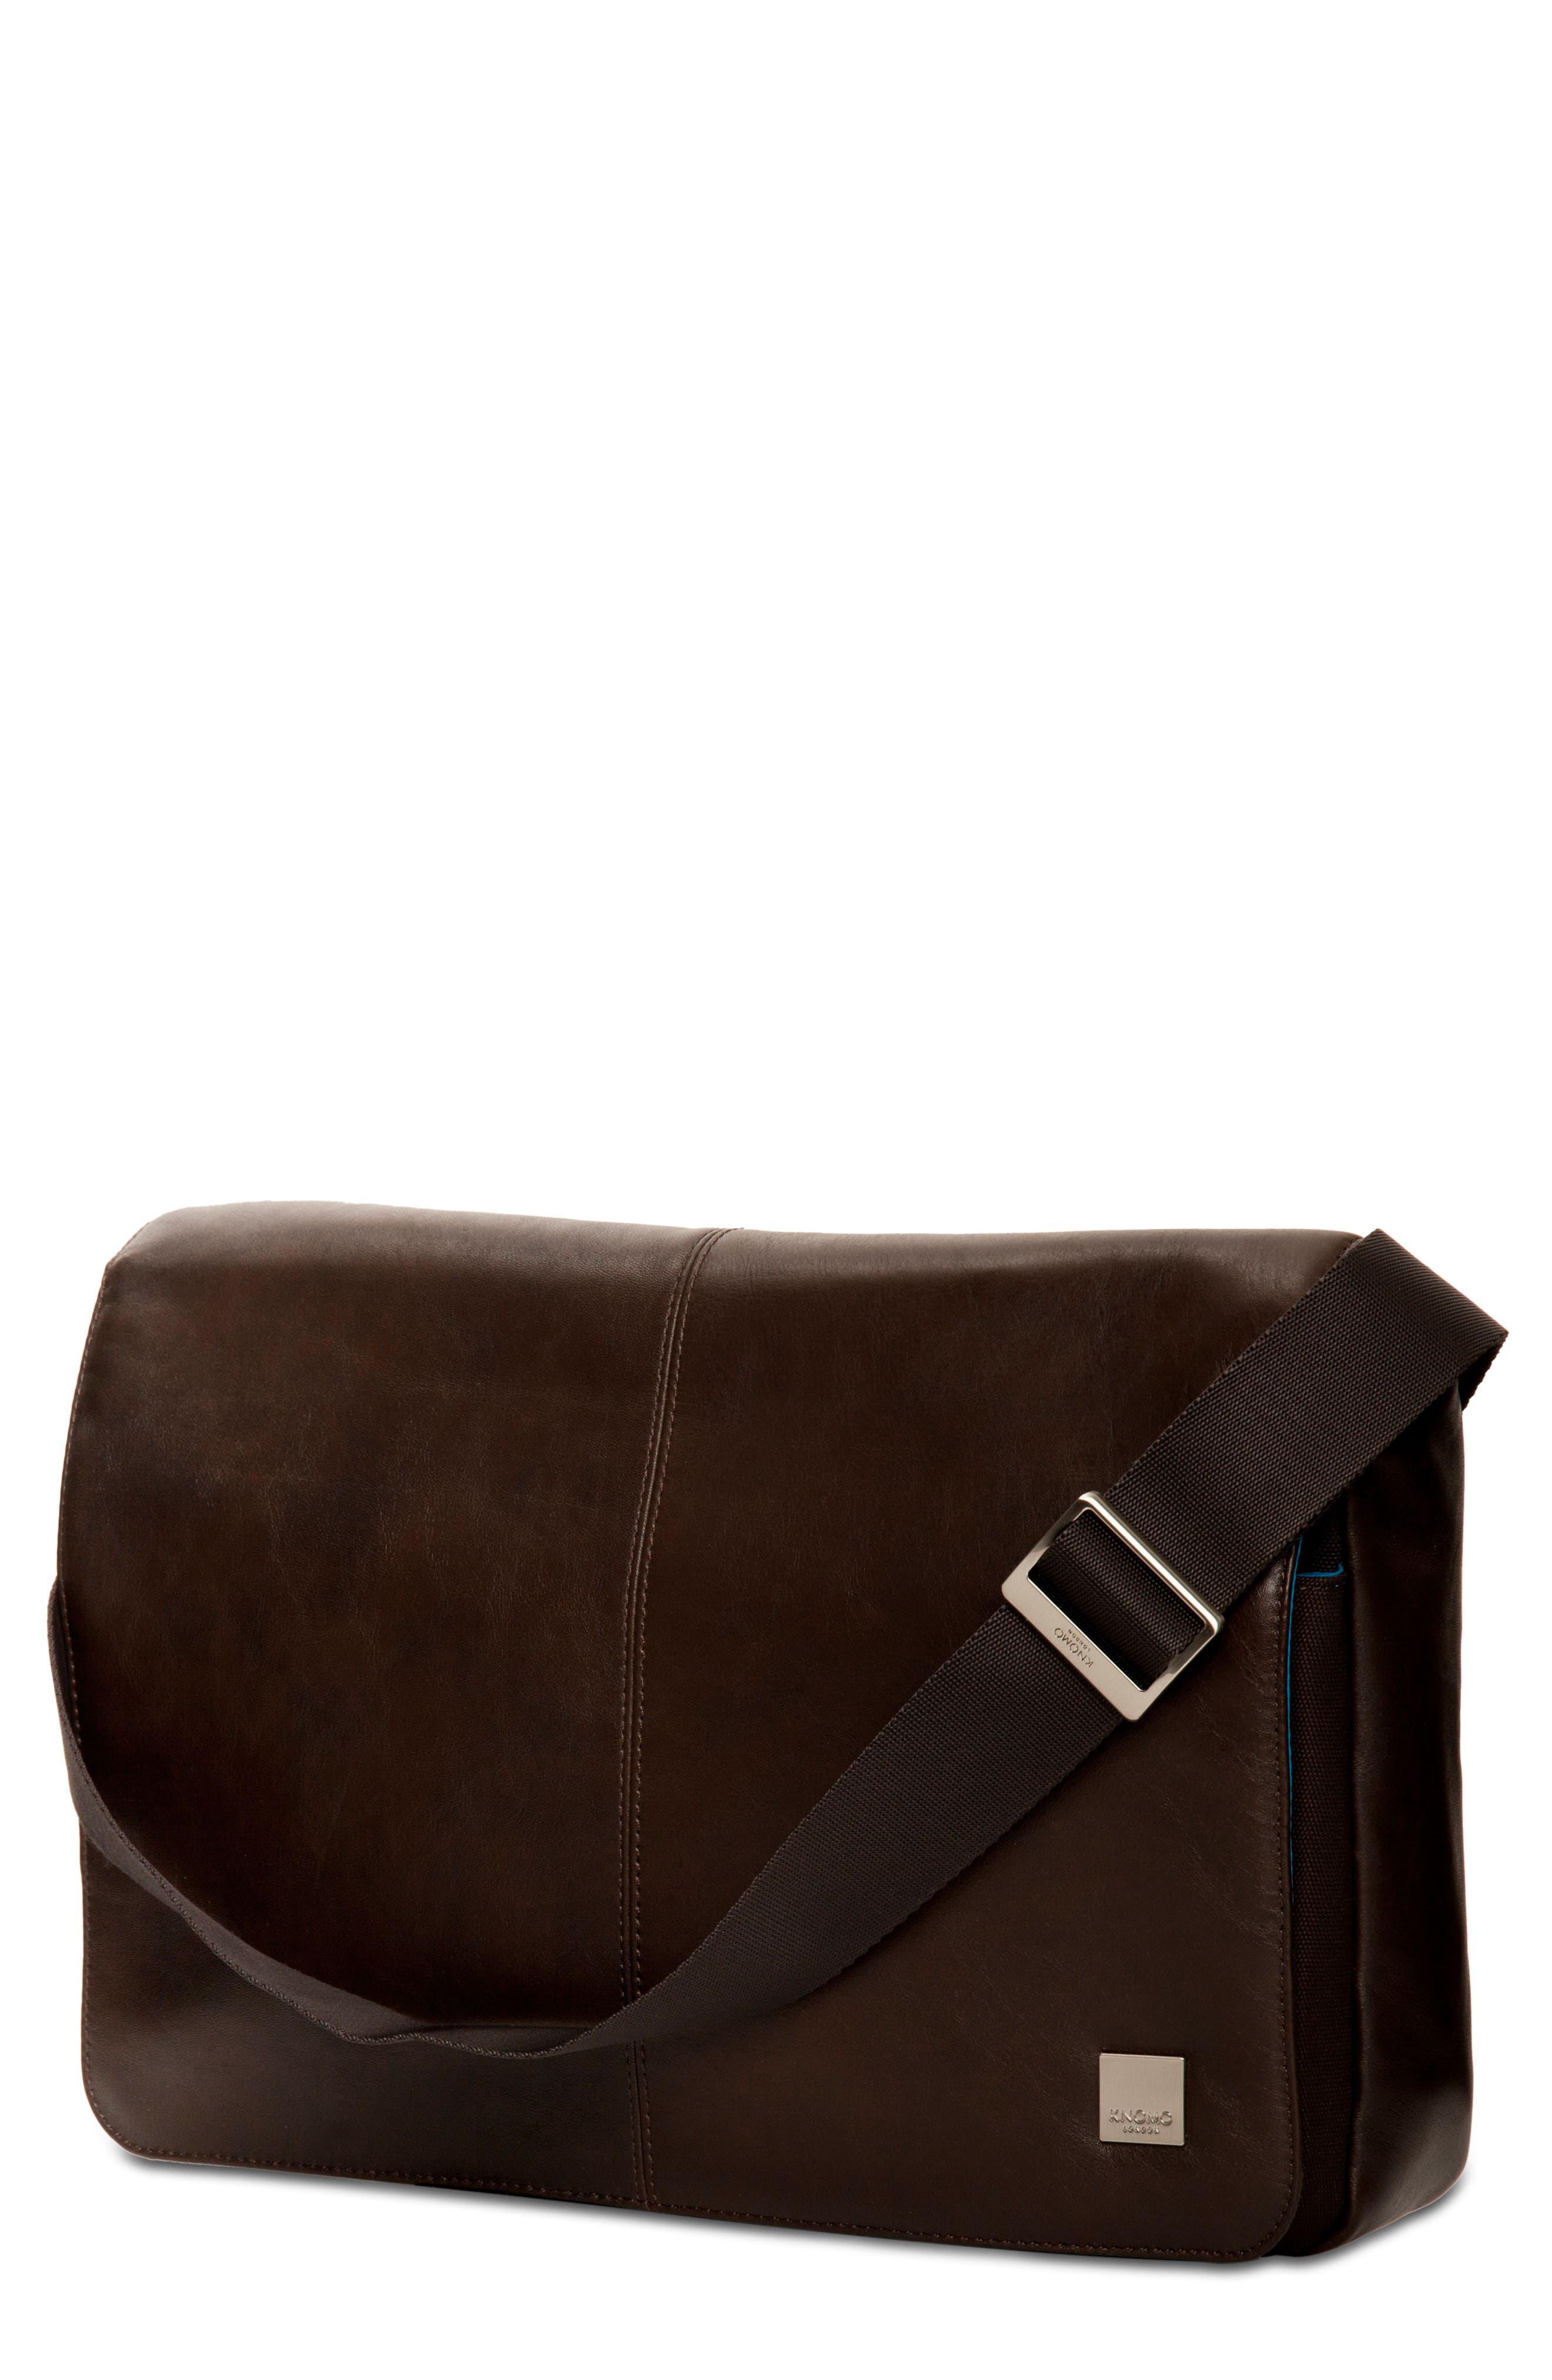 Alternate Image 1 Selected - KNOMO London Brompton Kinsale RFID Leather Messenger Bag